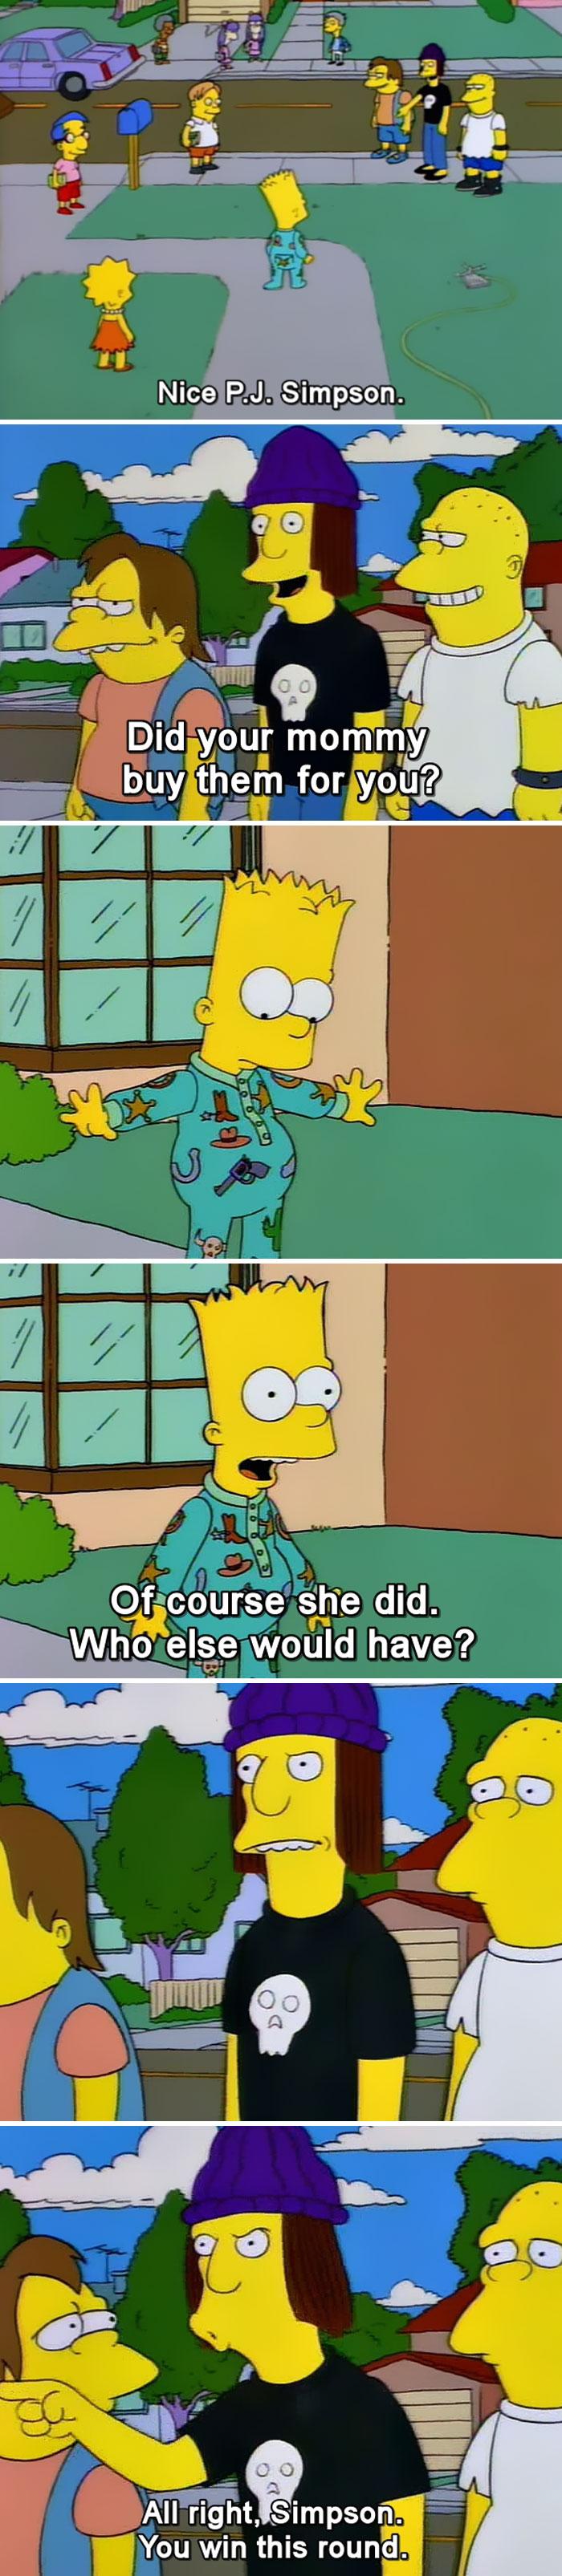 Simpsons Jokes